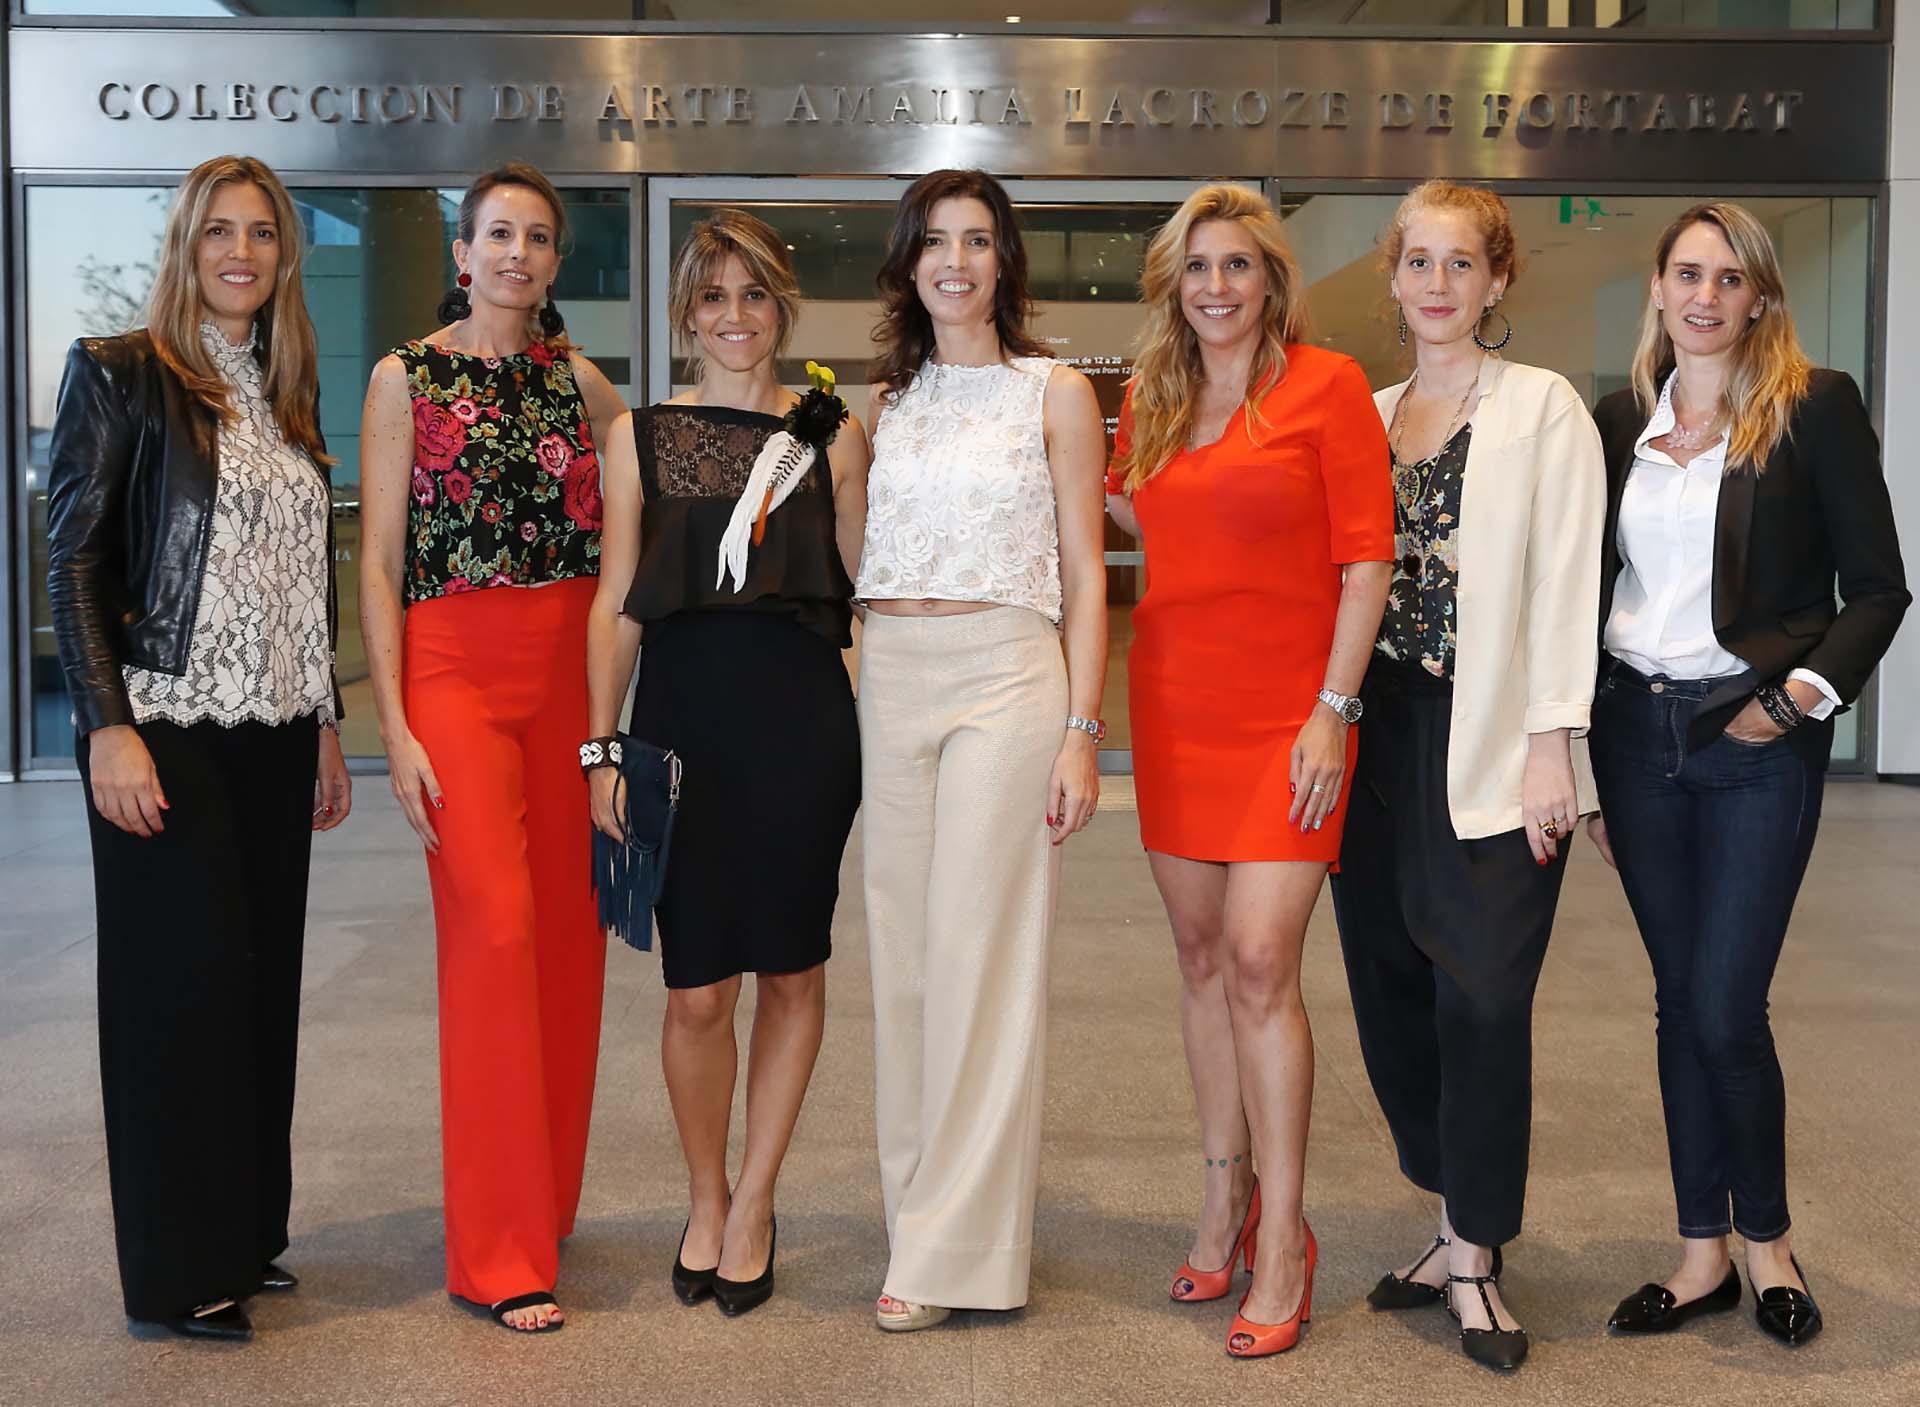 Mariana Cavalli, Lucrecia Cornejo. María Freytes, Angie Braun, Amalia Amoedo, Stefy Jaugust y Evelin Thesing